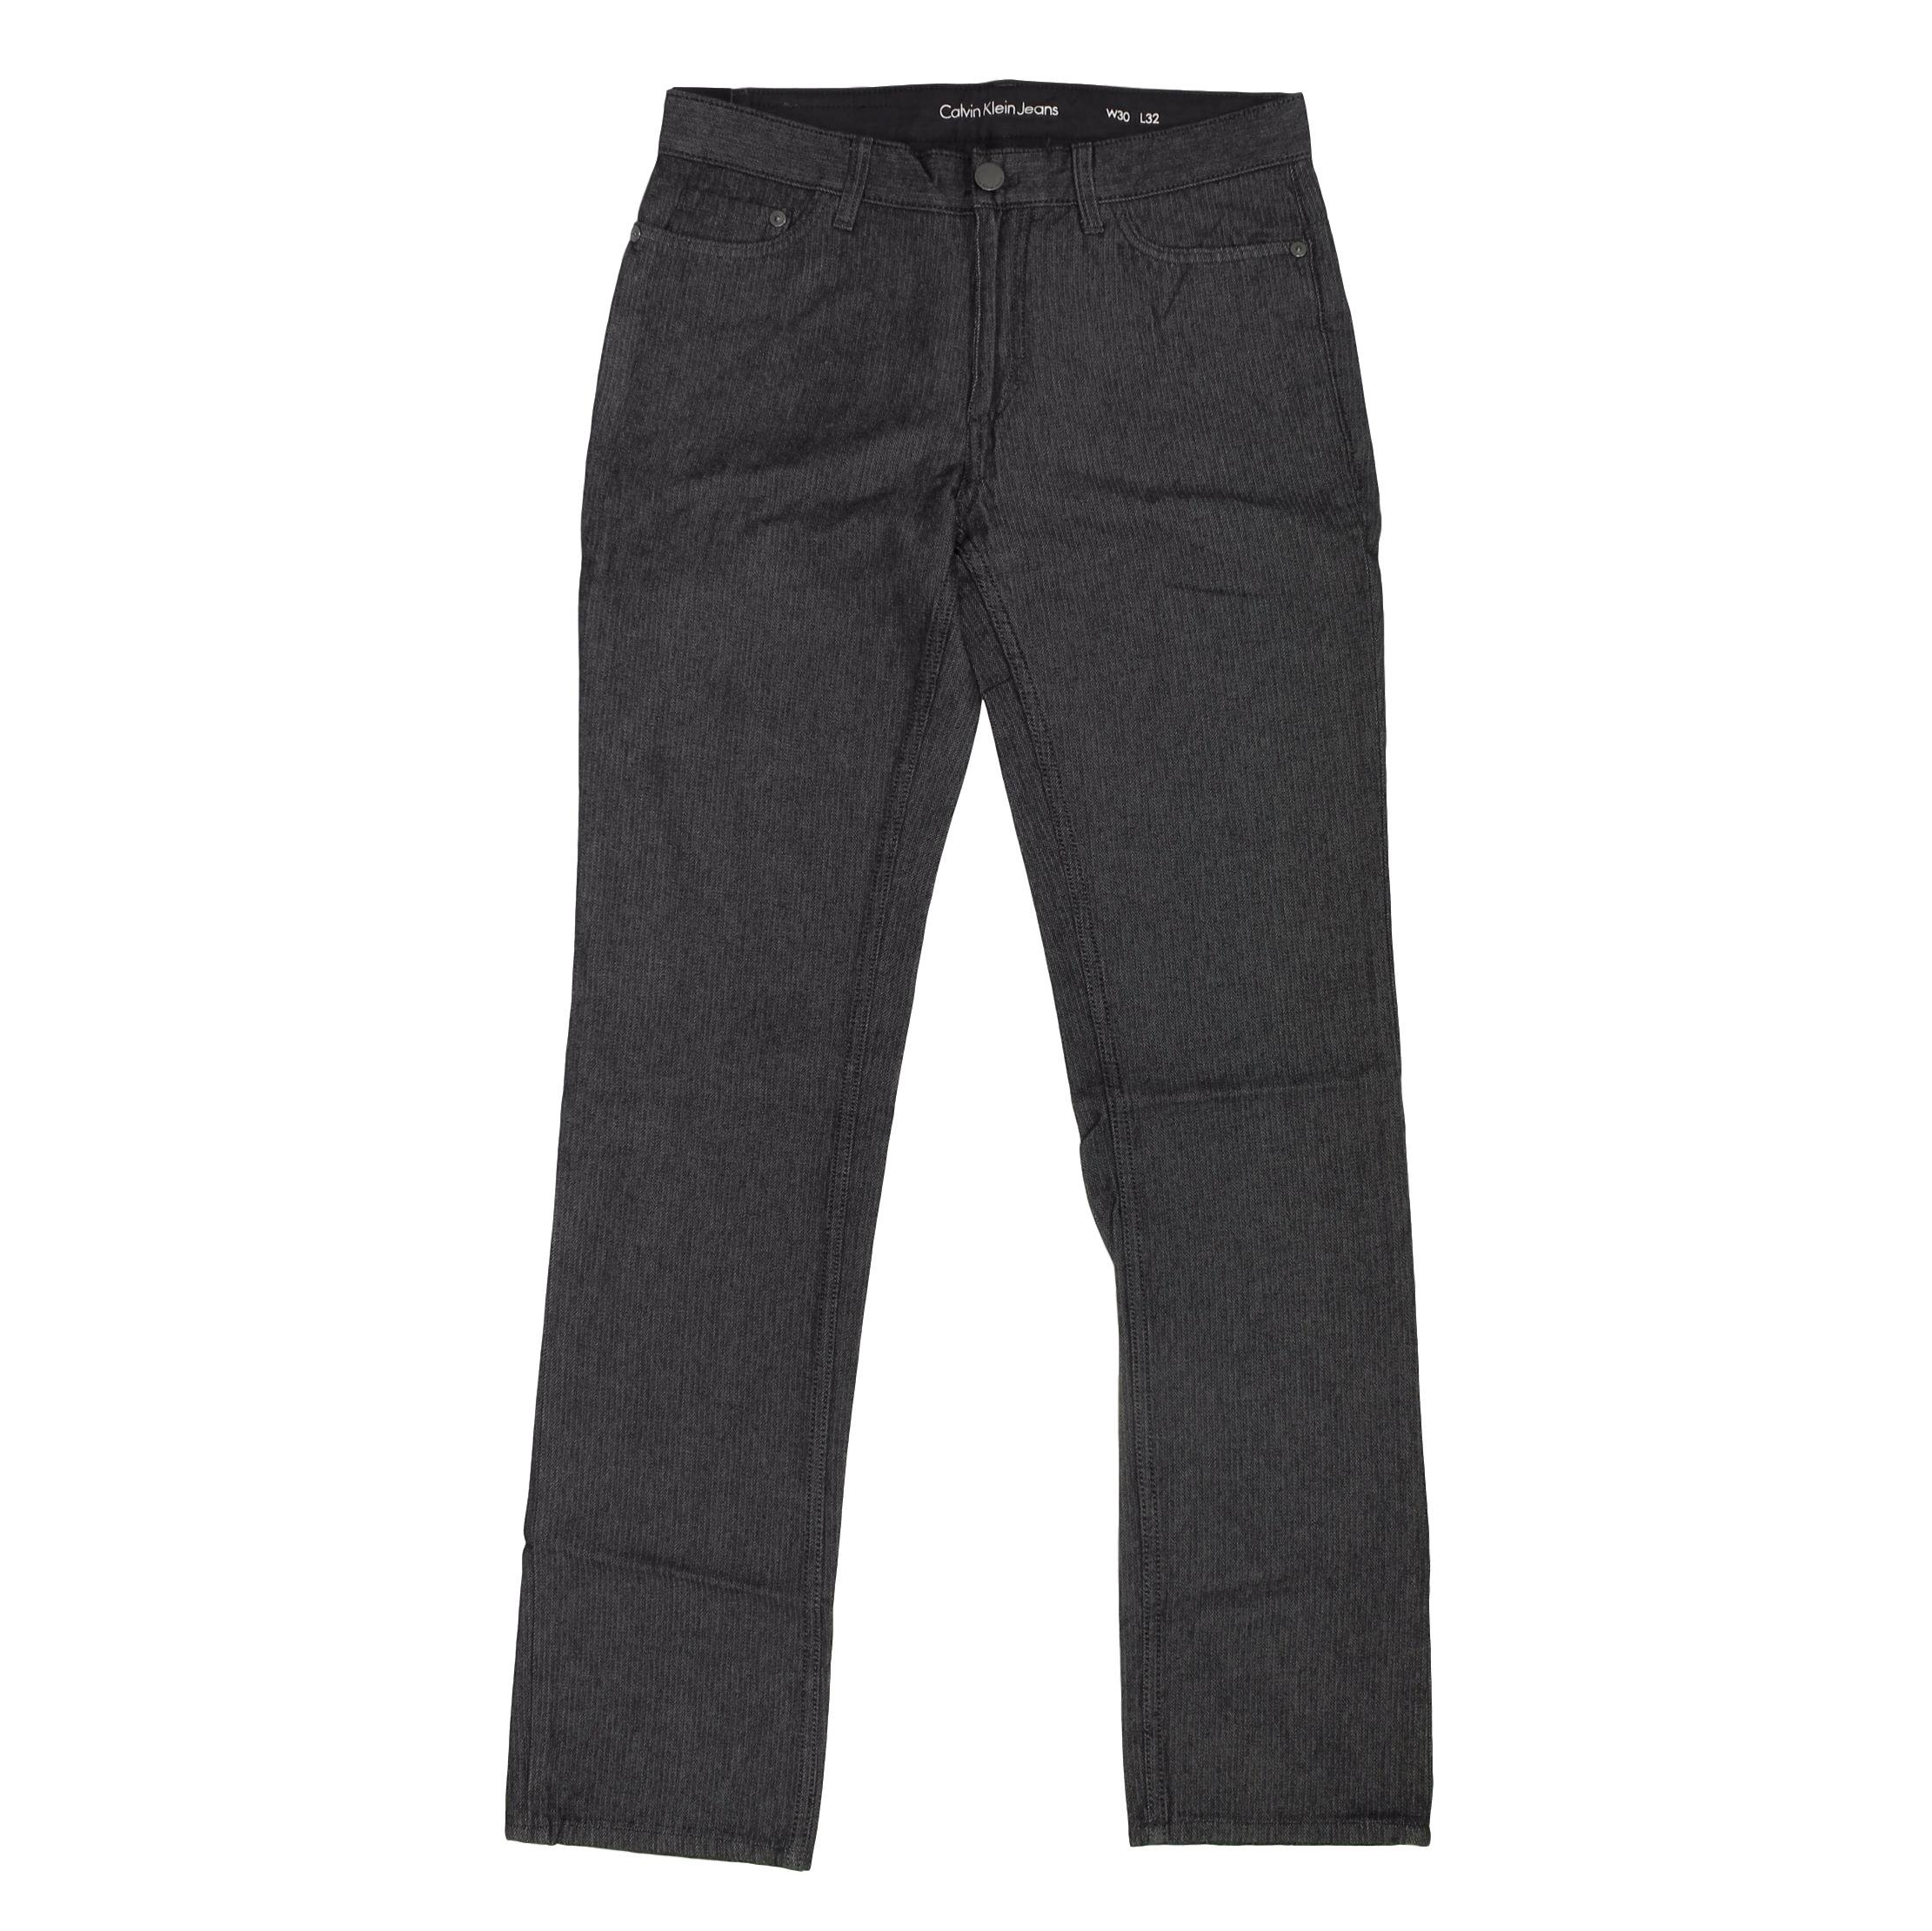 Calvin Klein Jeans Mens Herringbone 5 Pocket Slim Straight Pant (38x34, Chrome)